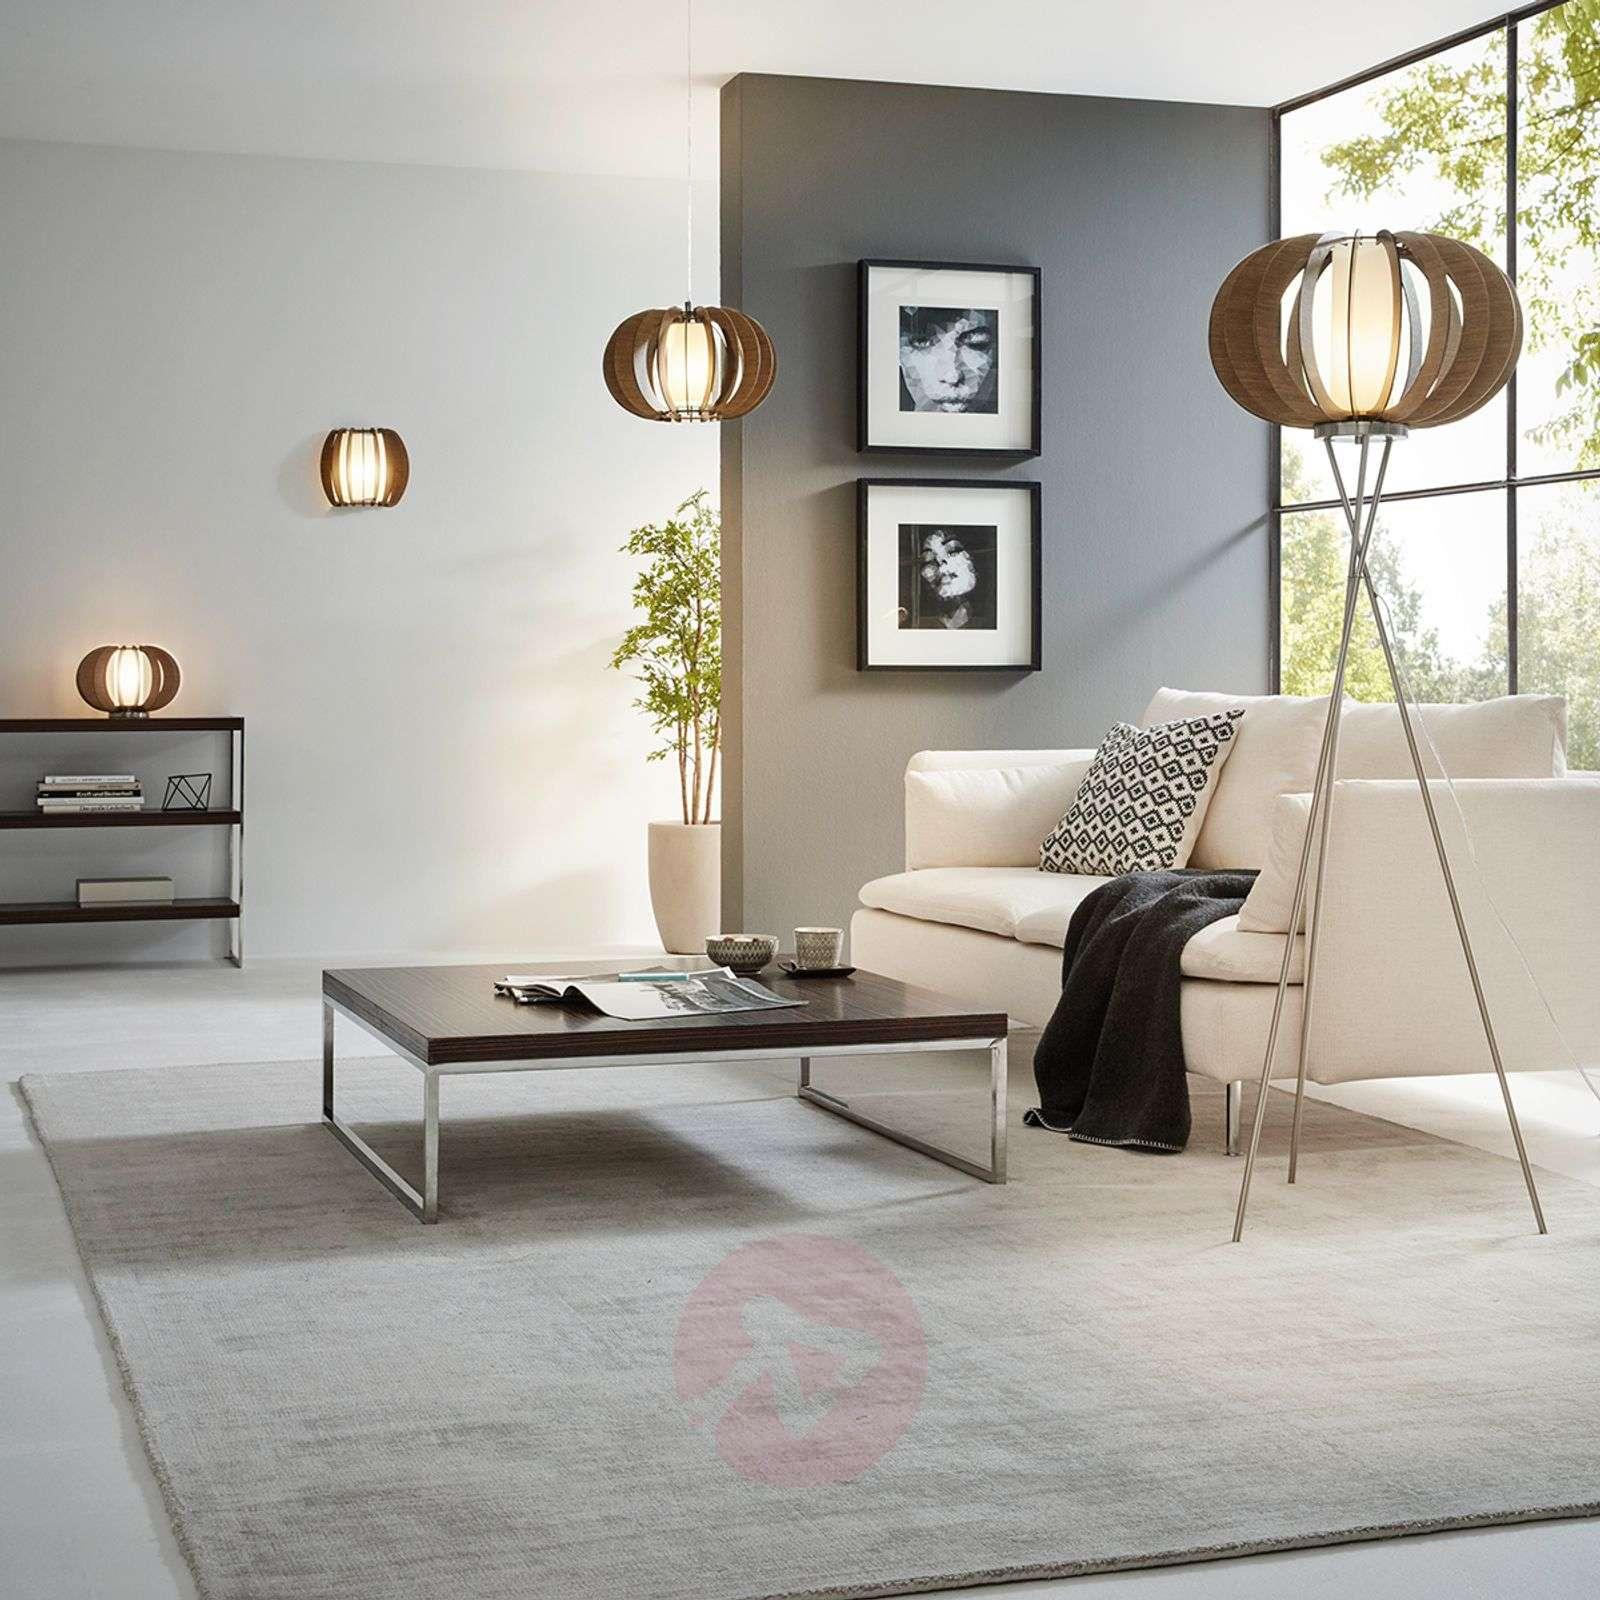 Wonderfully designed Stellato table lamp-3031899-01